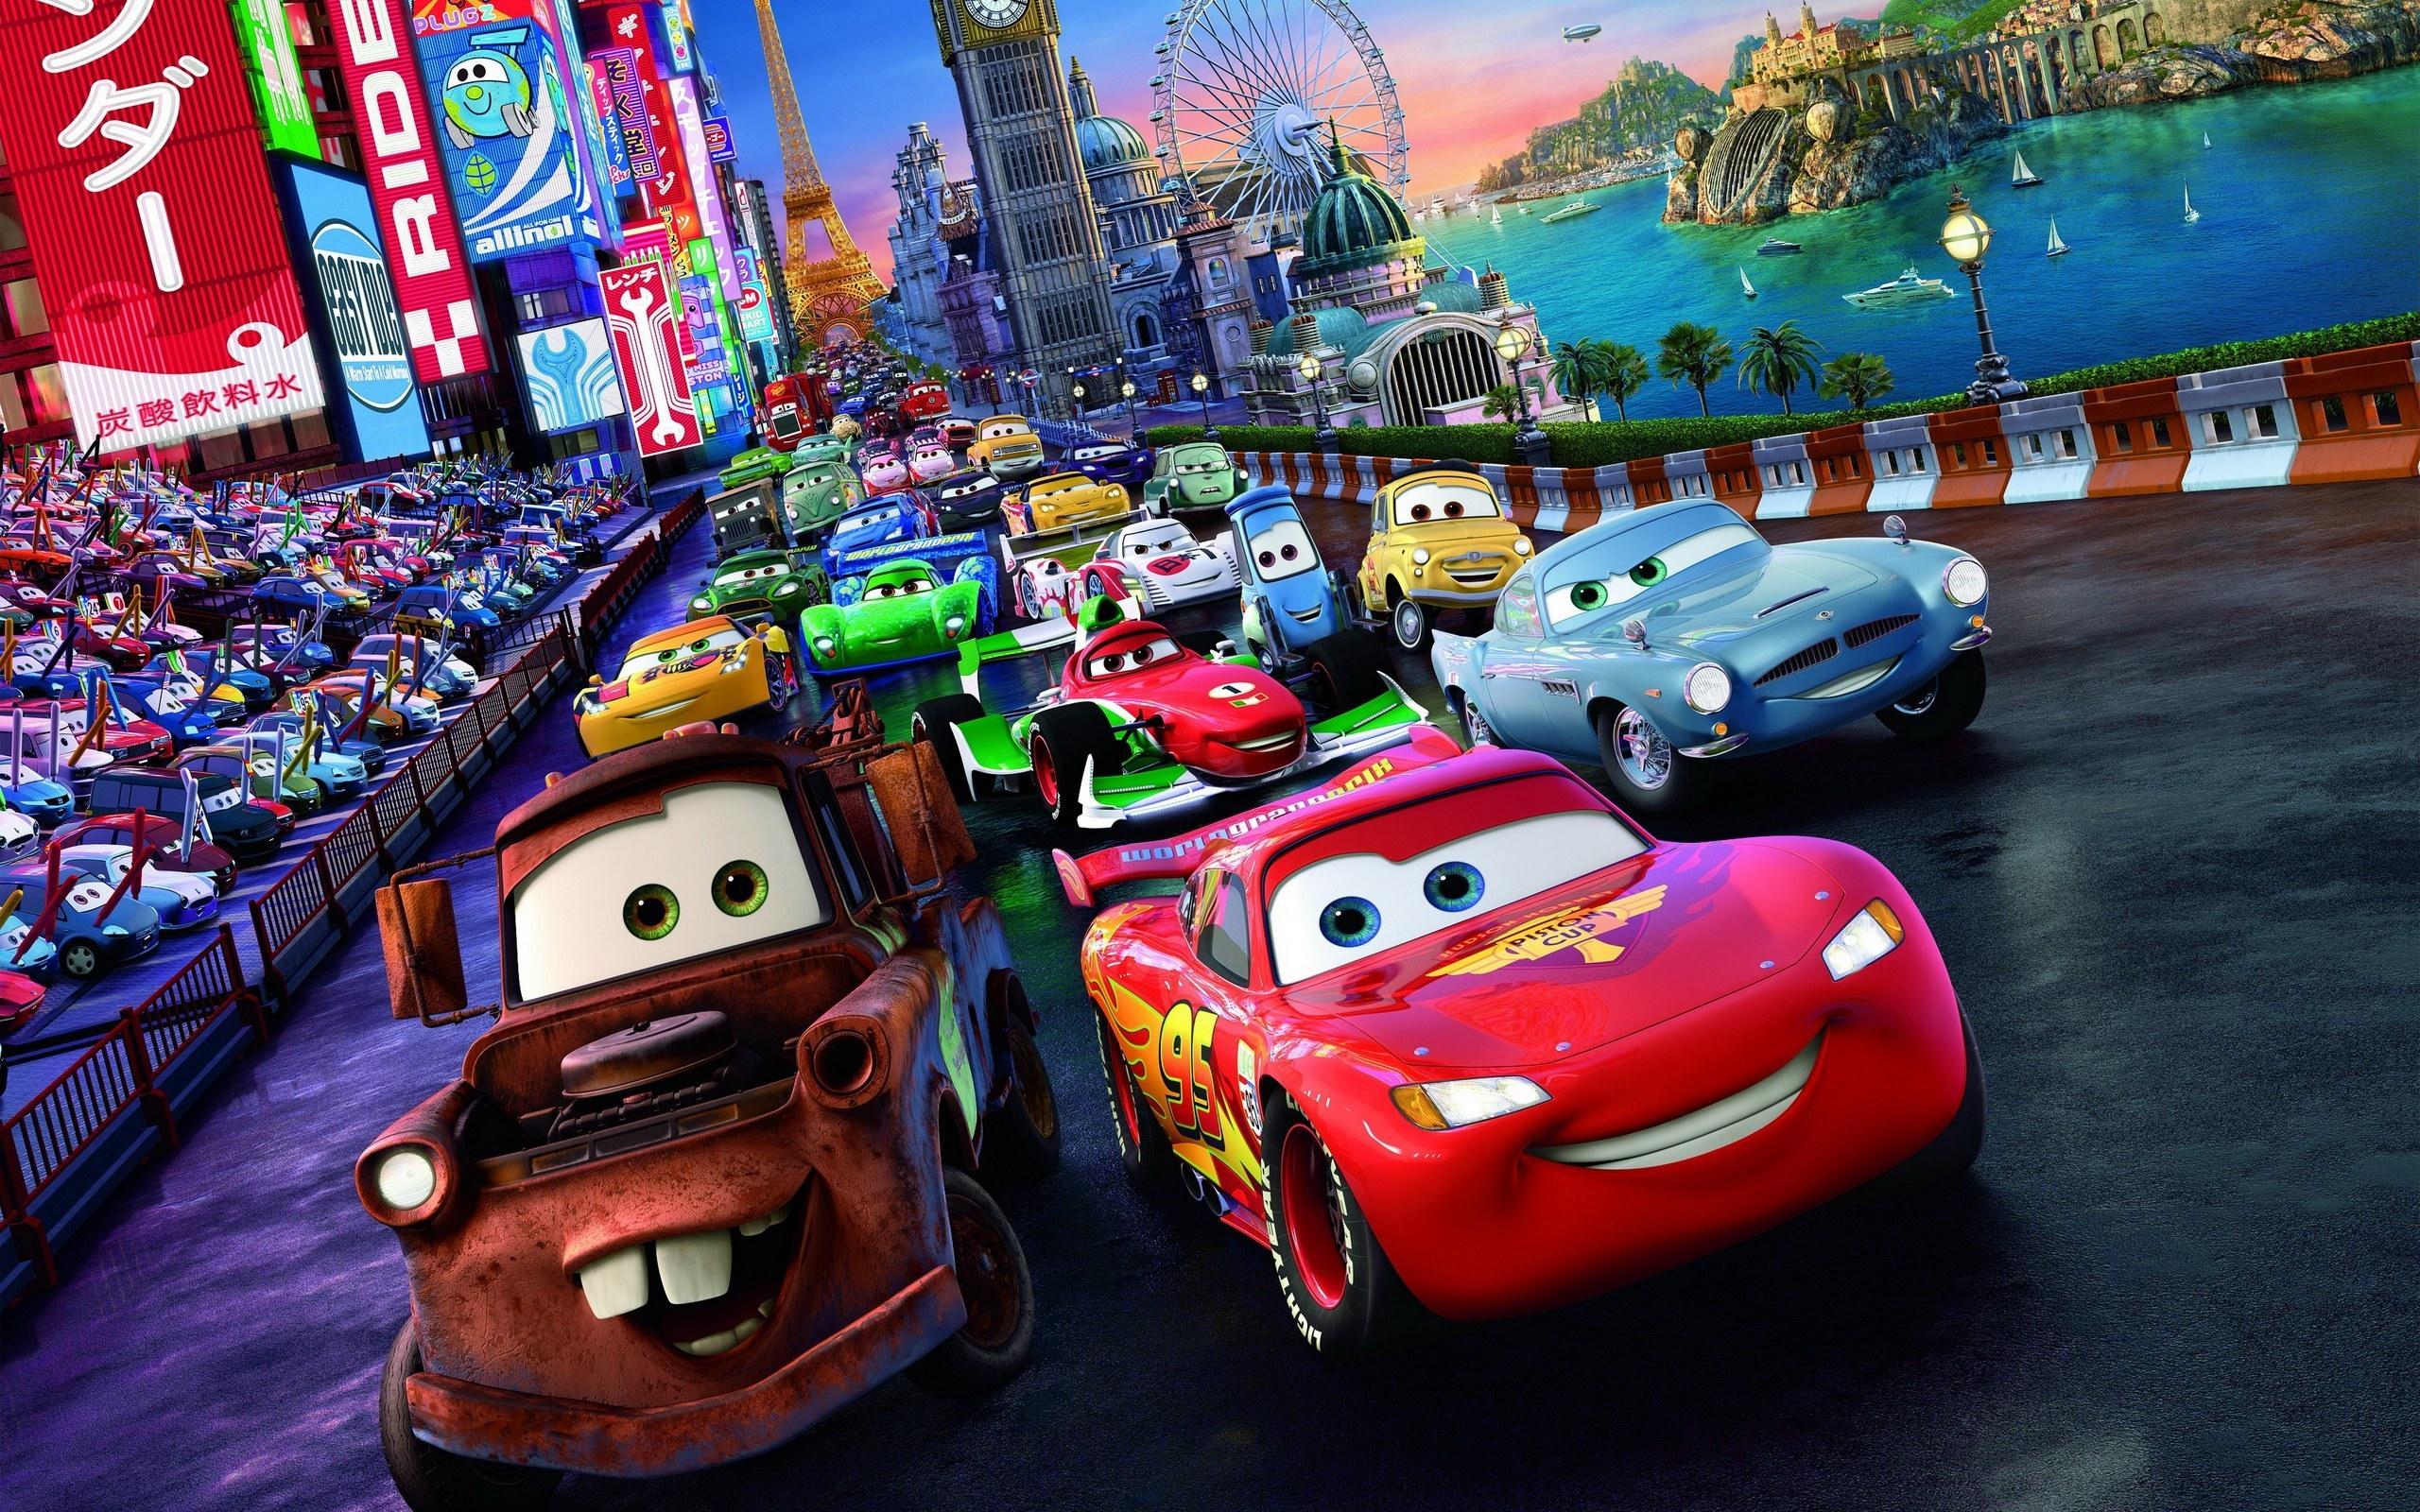 cars mcqueen disney pixar movies characters lightning mater mad rayo カー mate para race princess